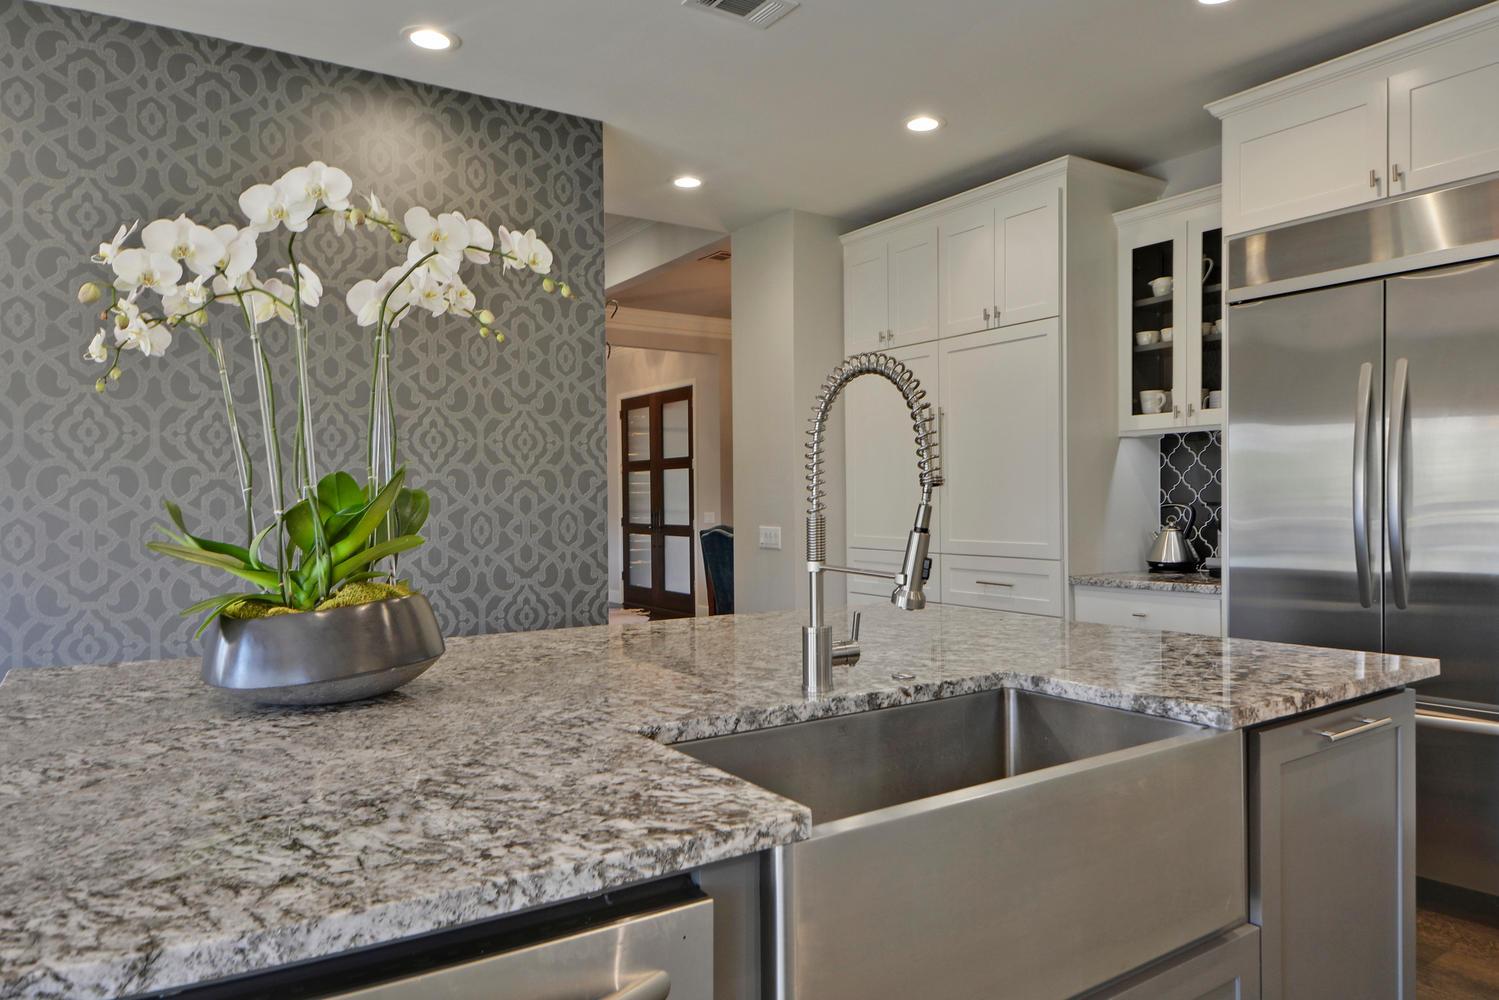 Farmhouse sink in kitchen remodel